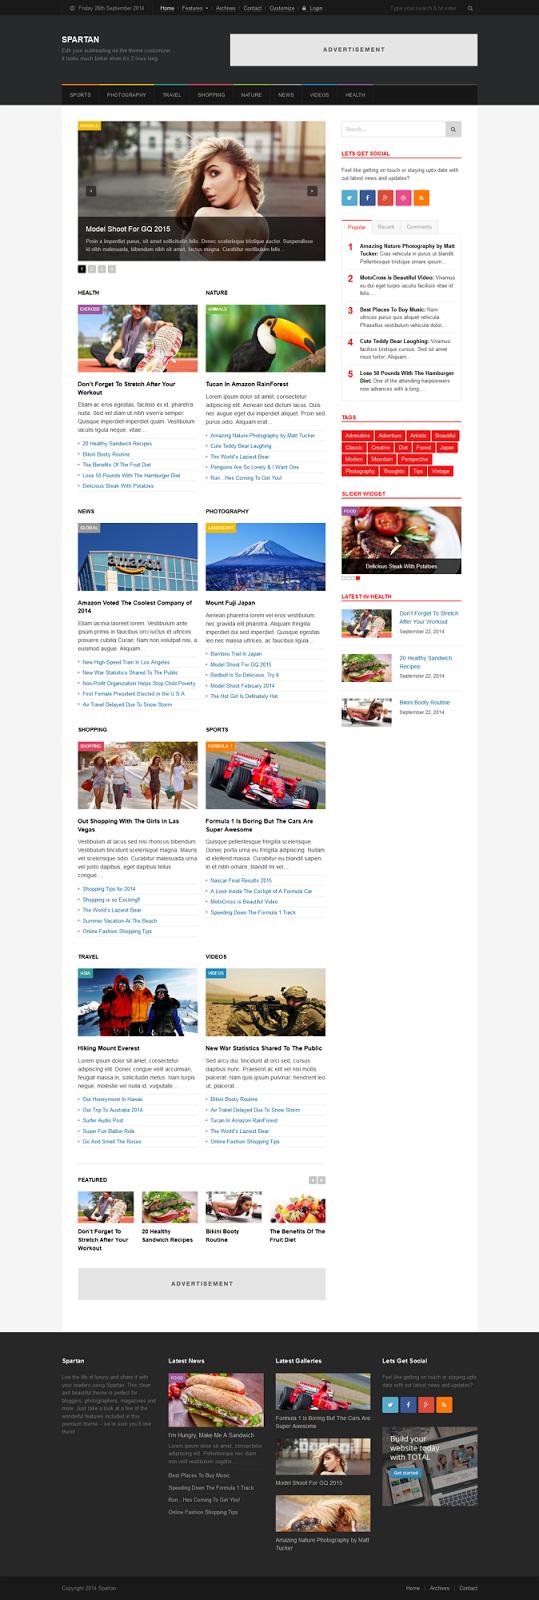 Free News and Magazine WordPress Theme